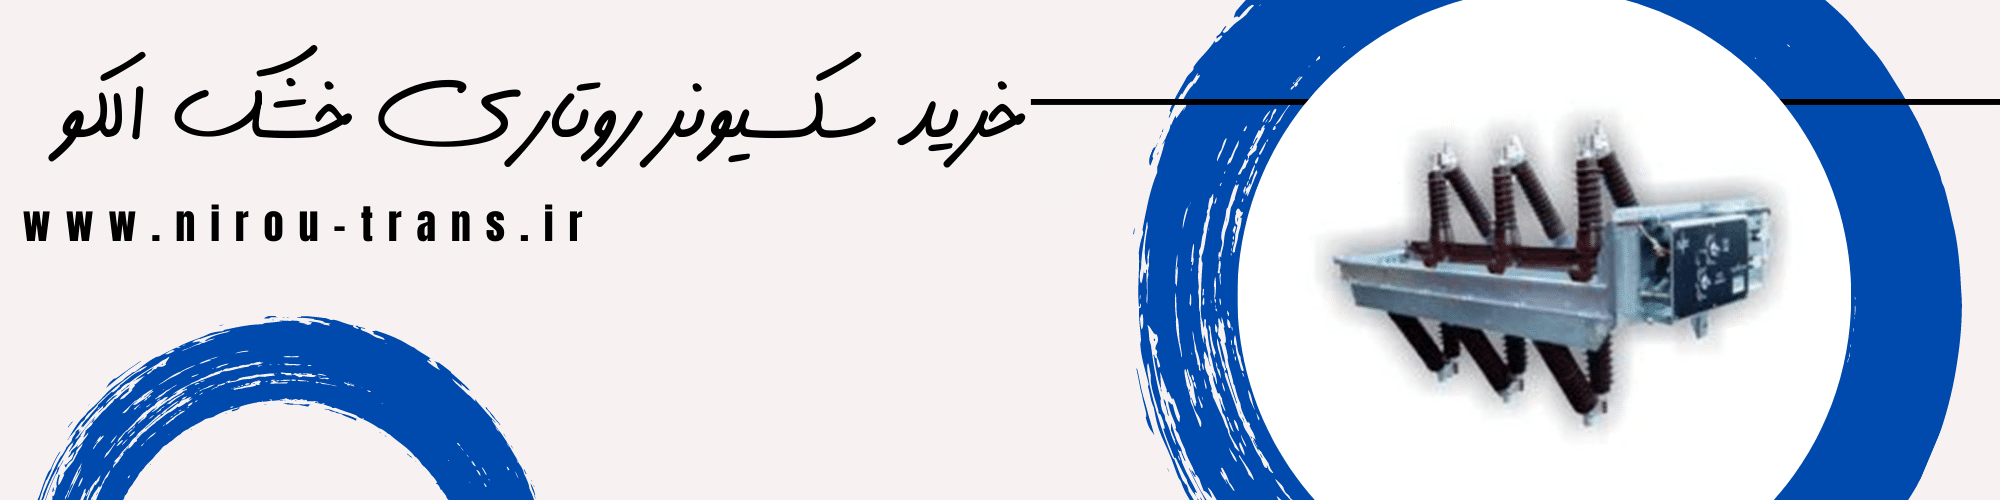 سکسیونر روتاری خشک الکو